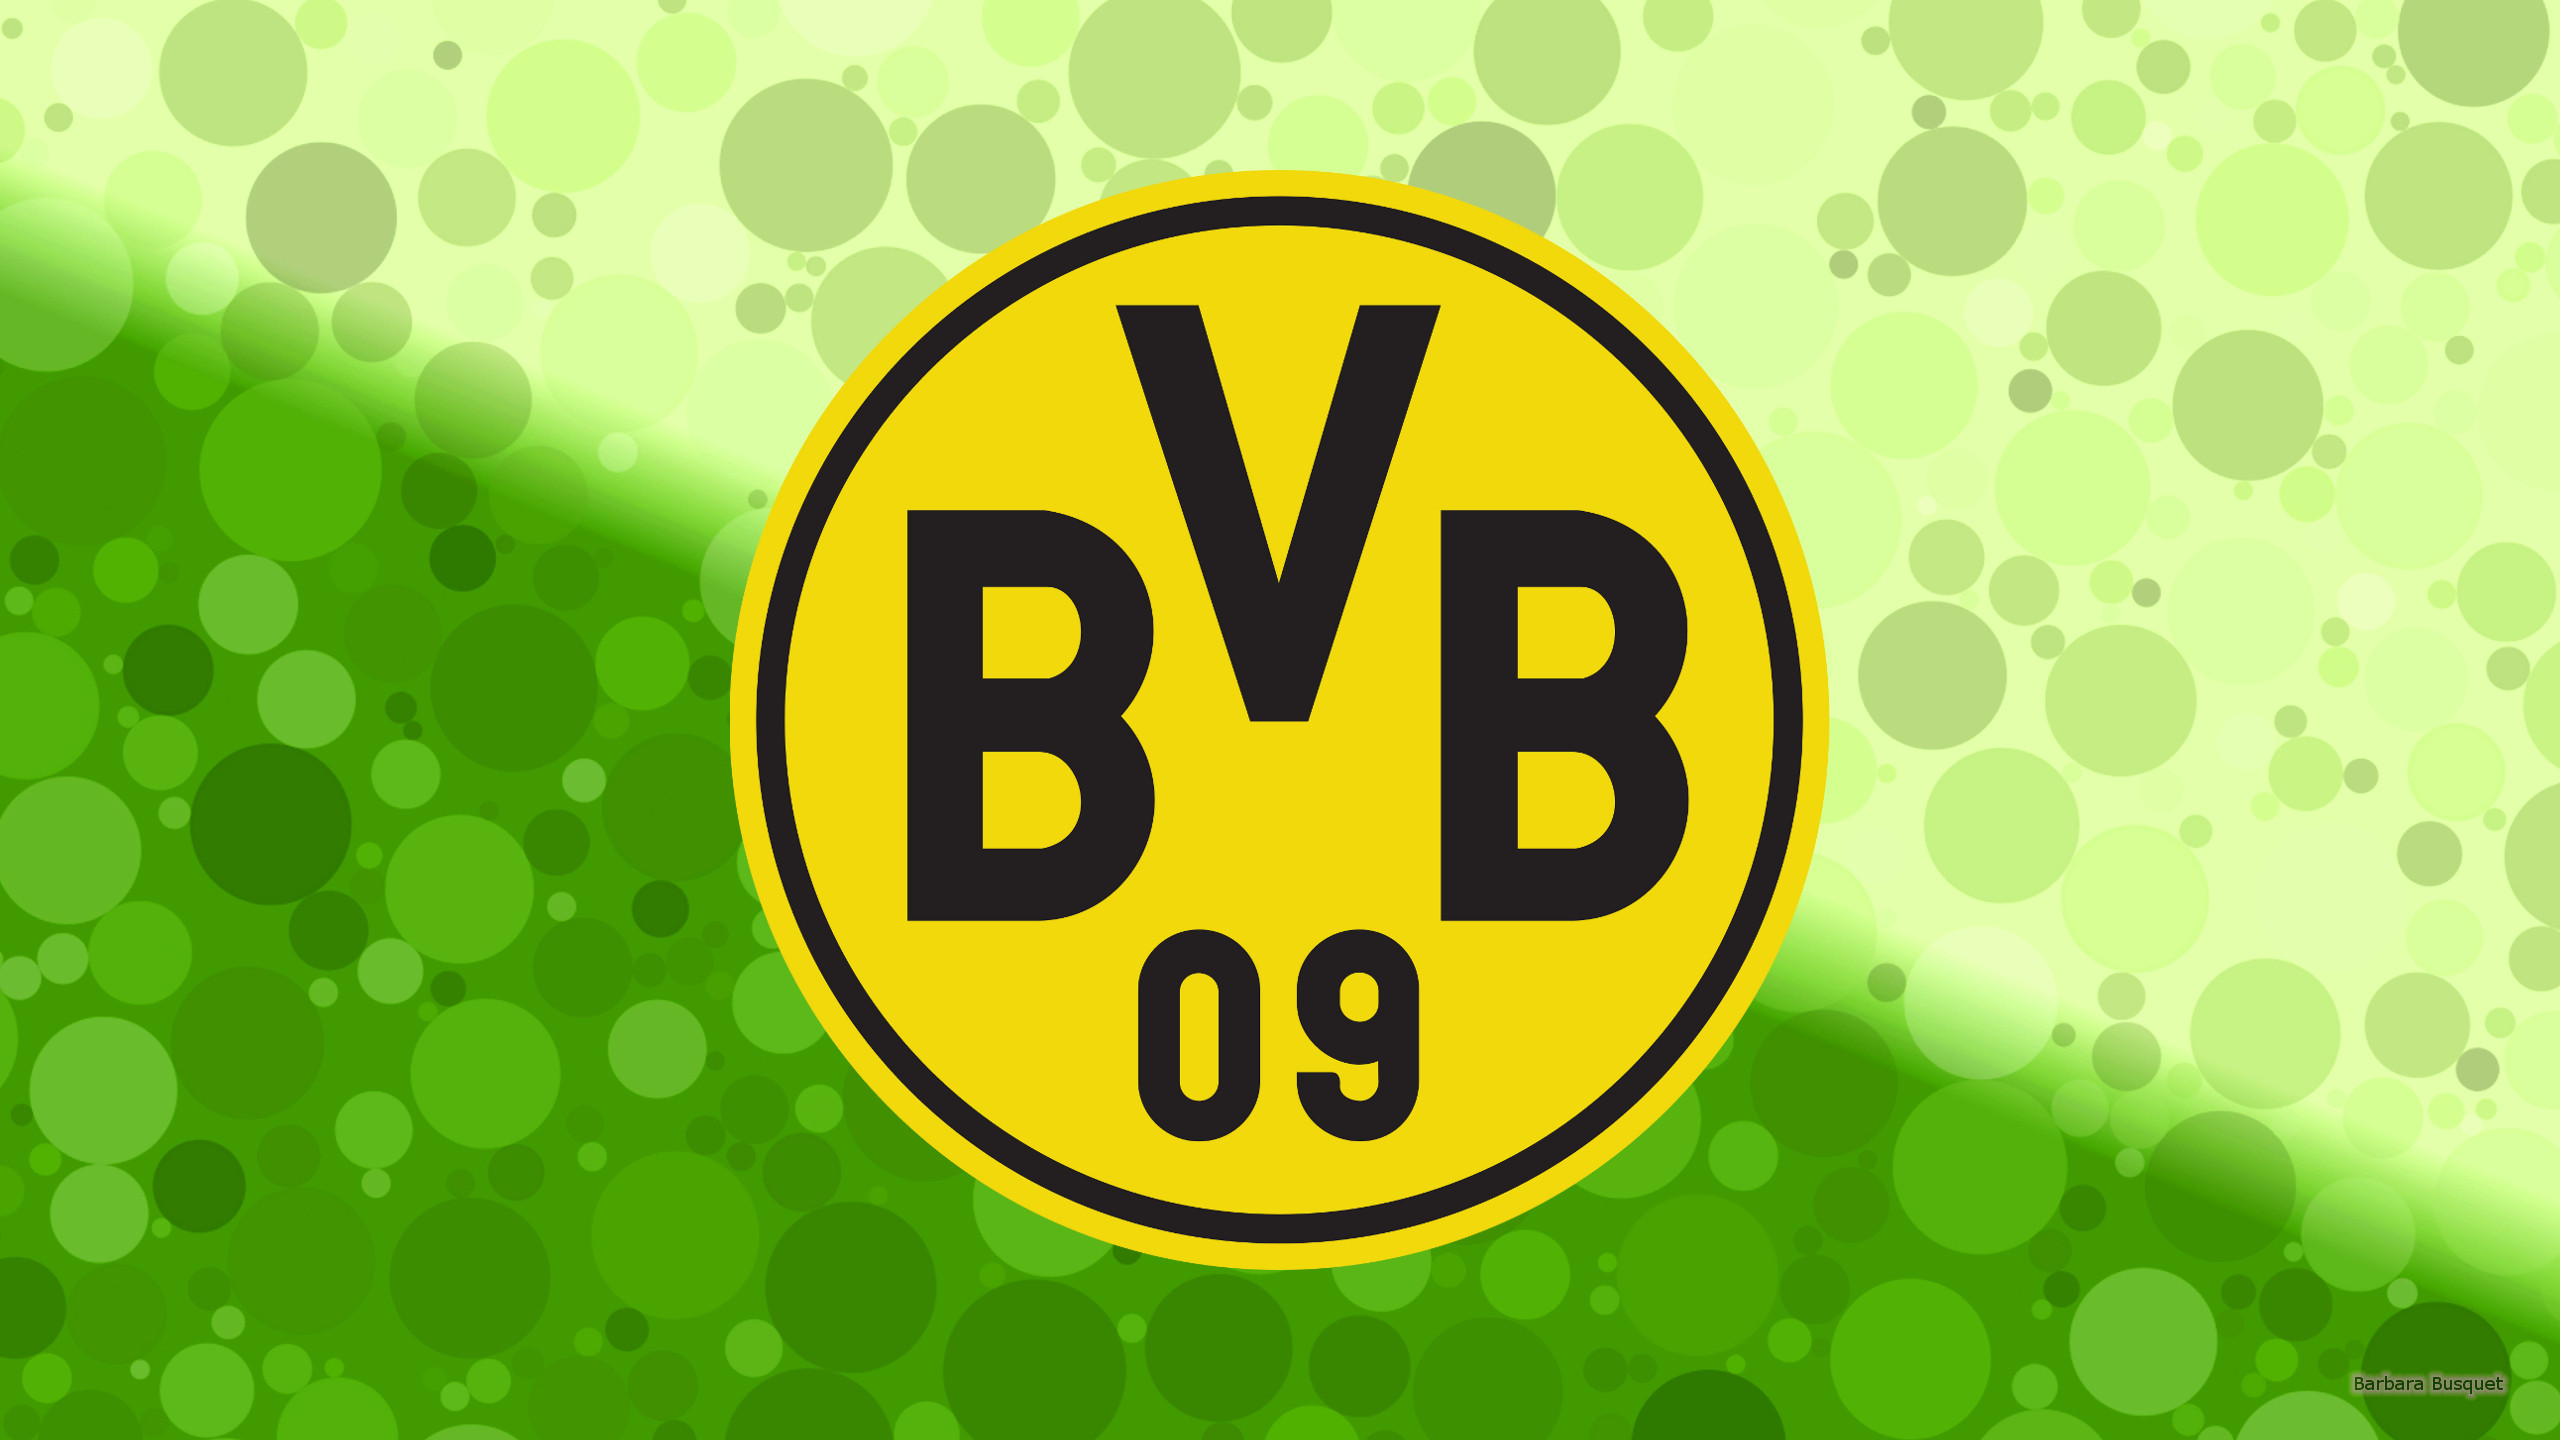 Borussia dortmund wallpapers barbaras hd wallpapers green borussia dortmund wallpaper with circles voltagebd Choice Image